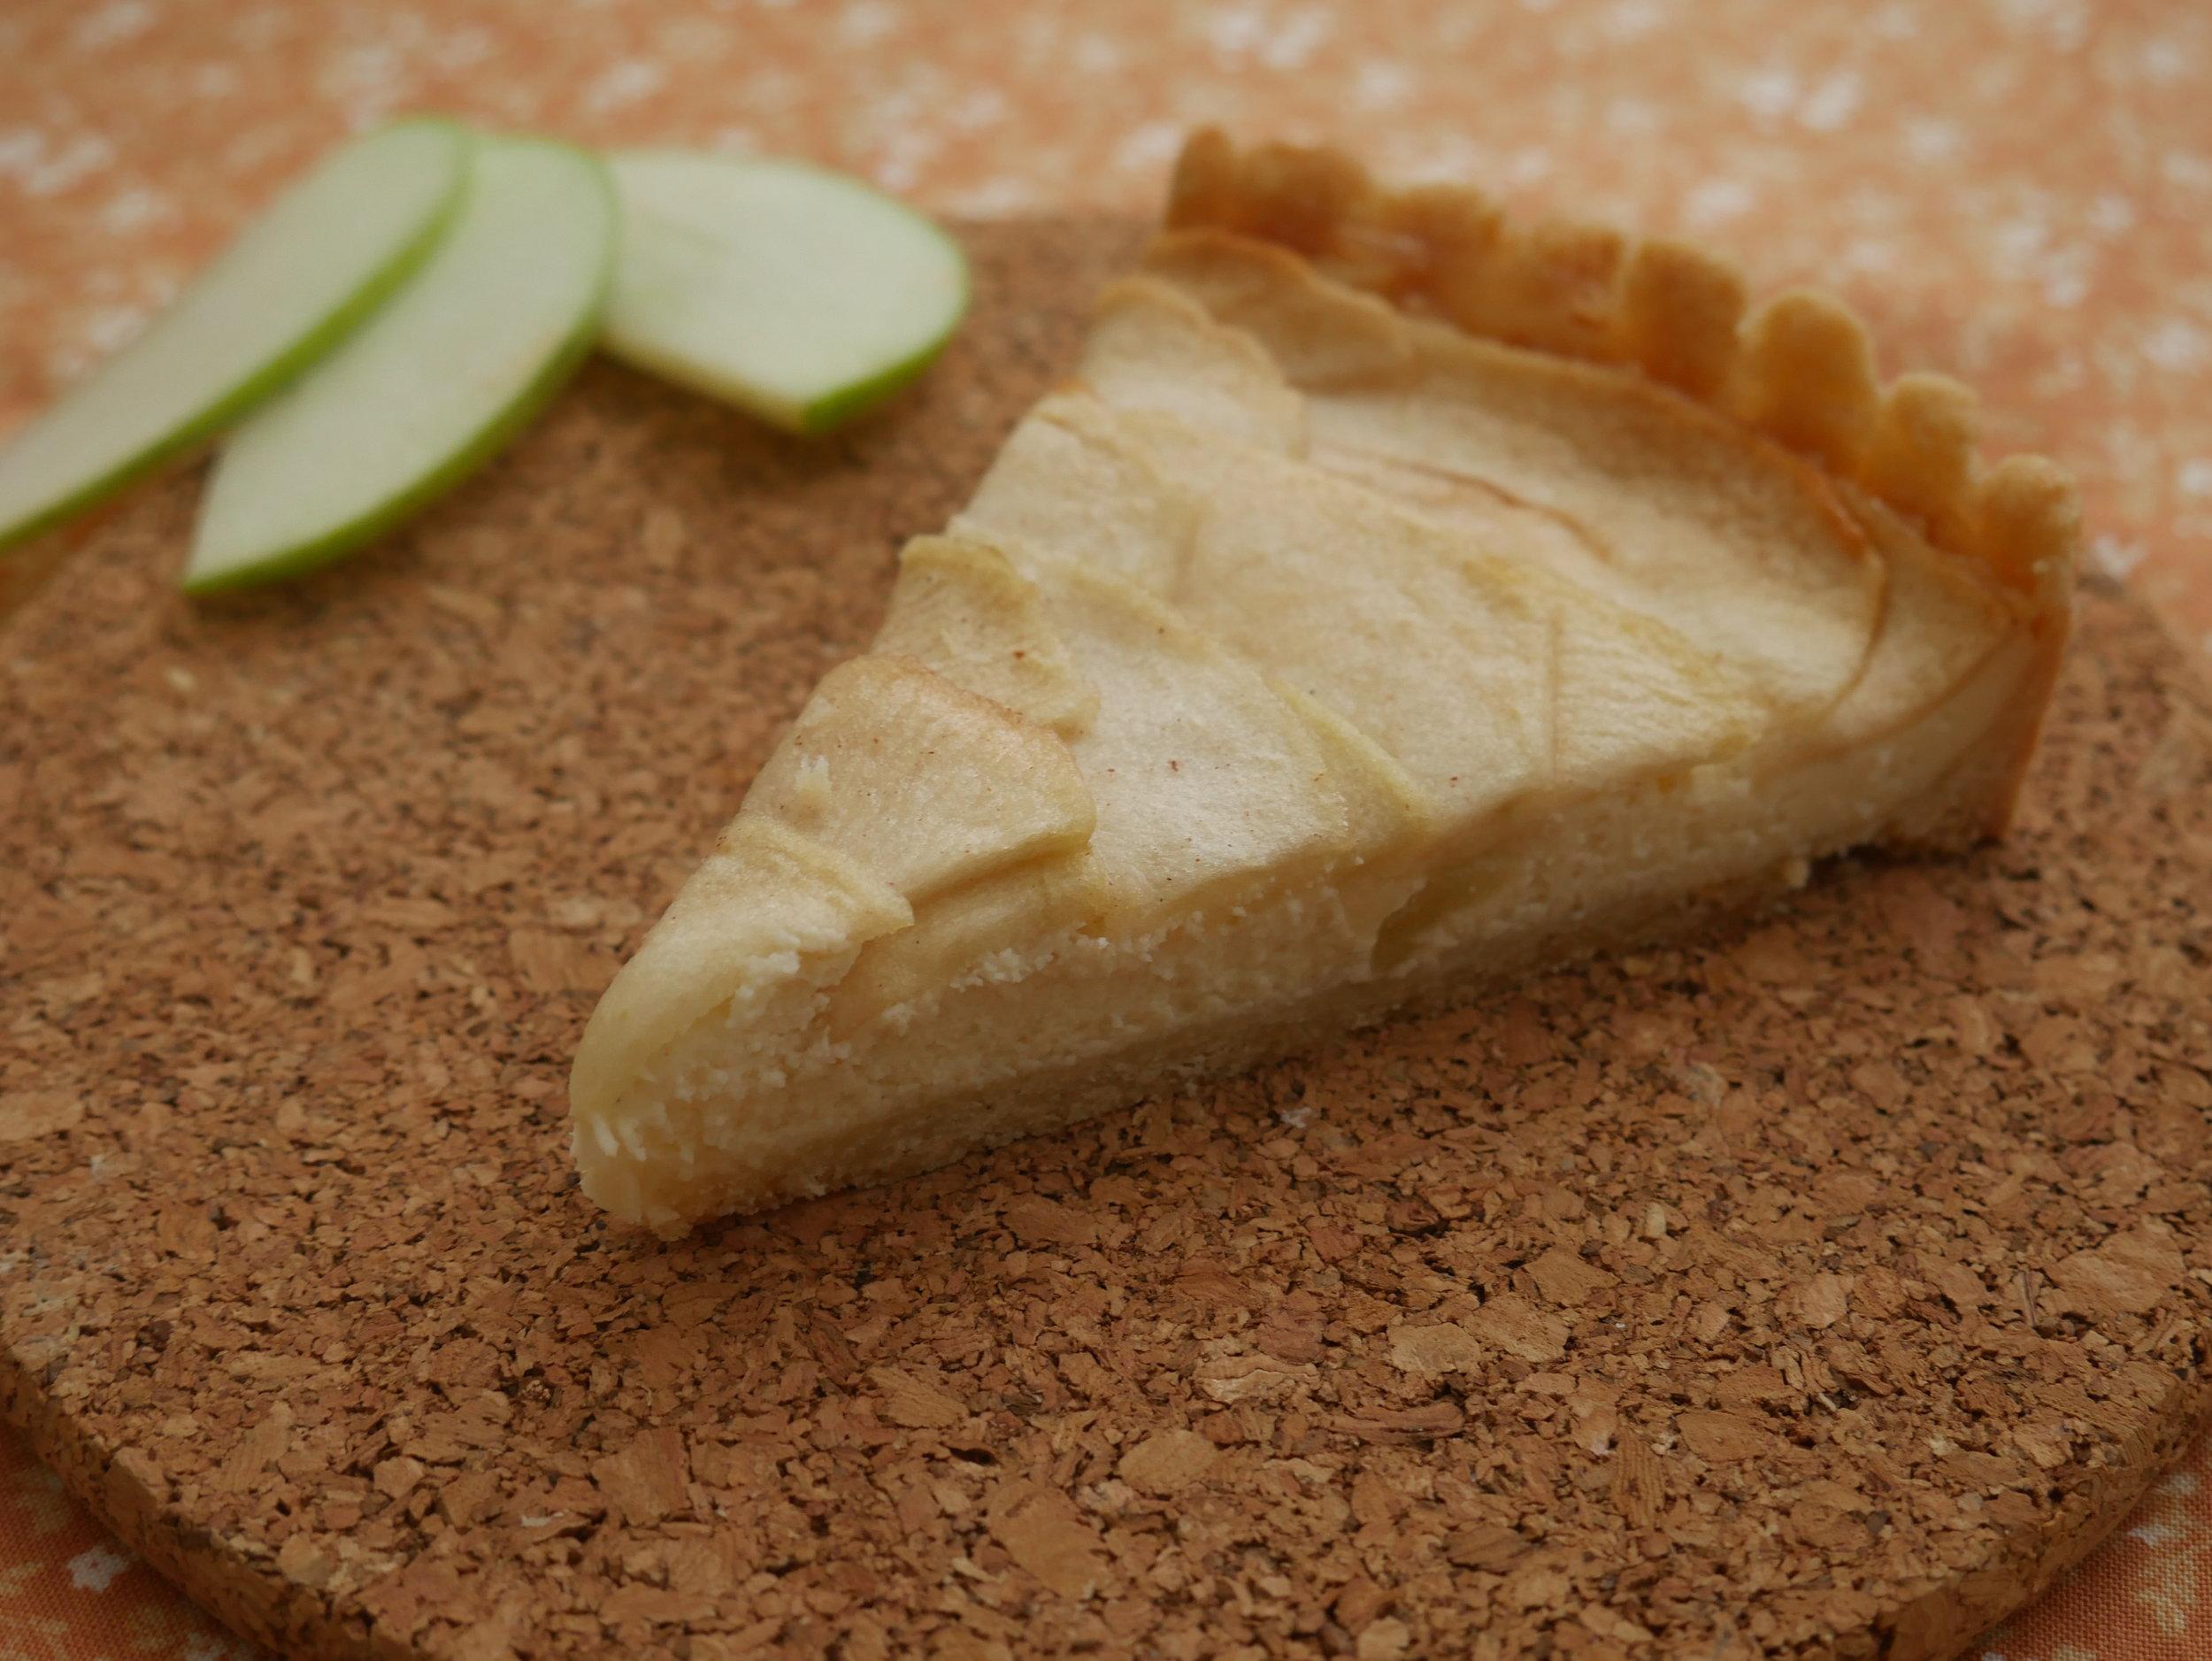 Ready for Fall - Apple Cream Cheese Tart